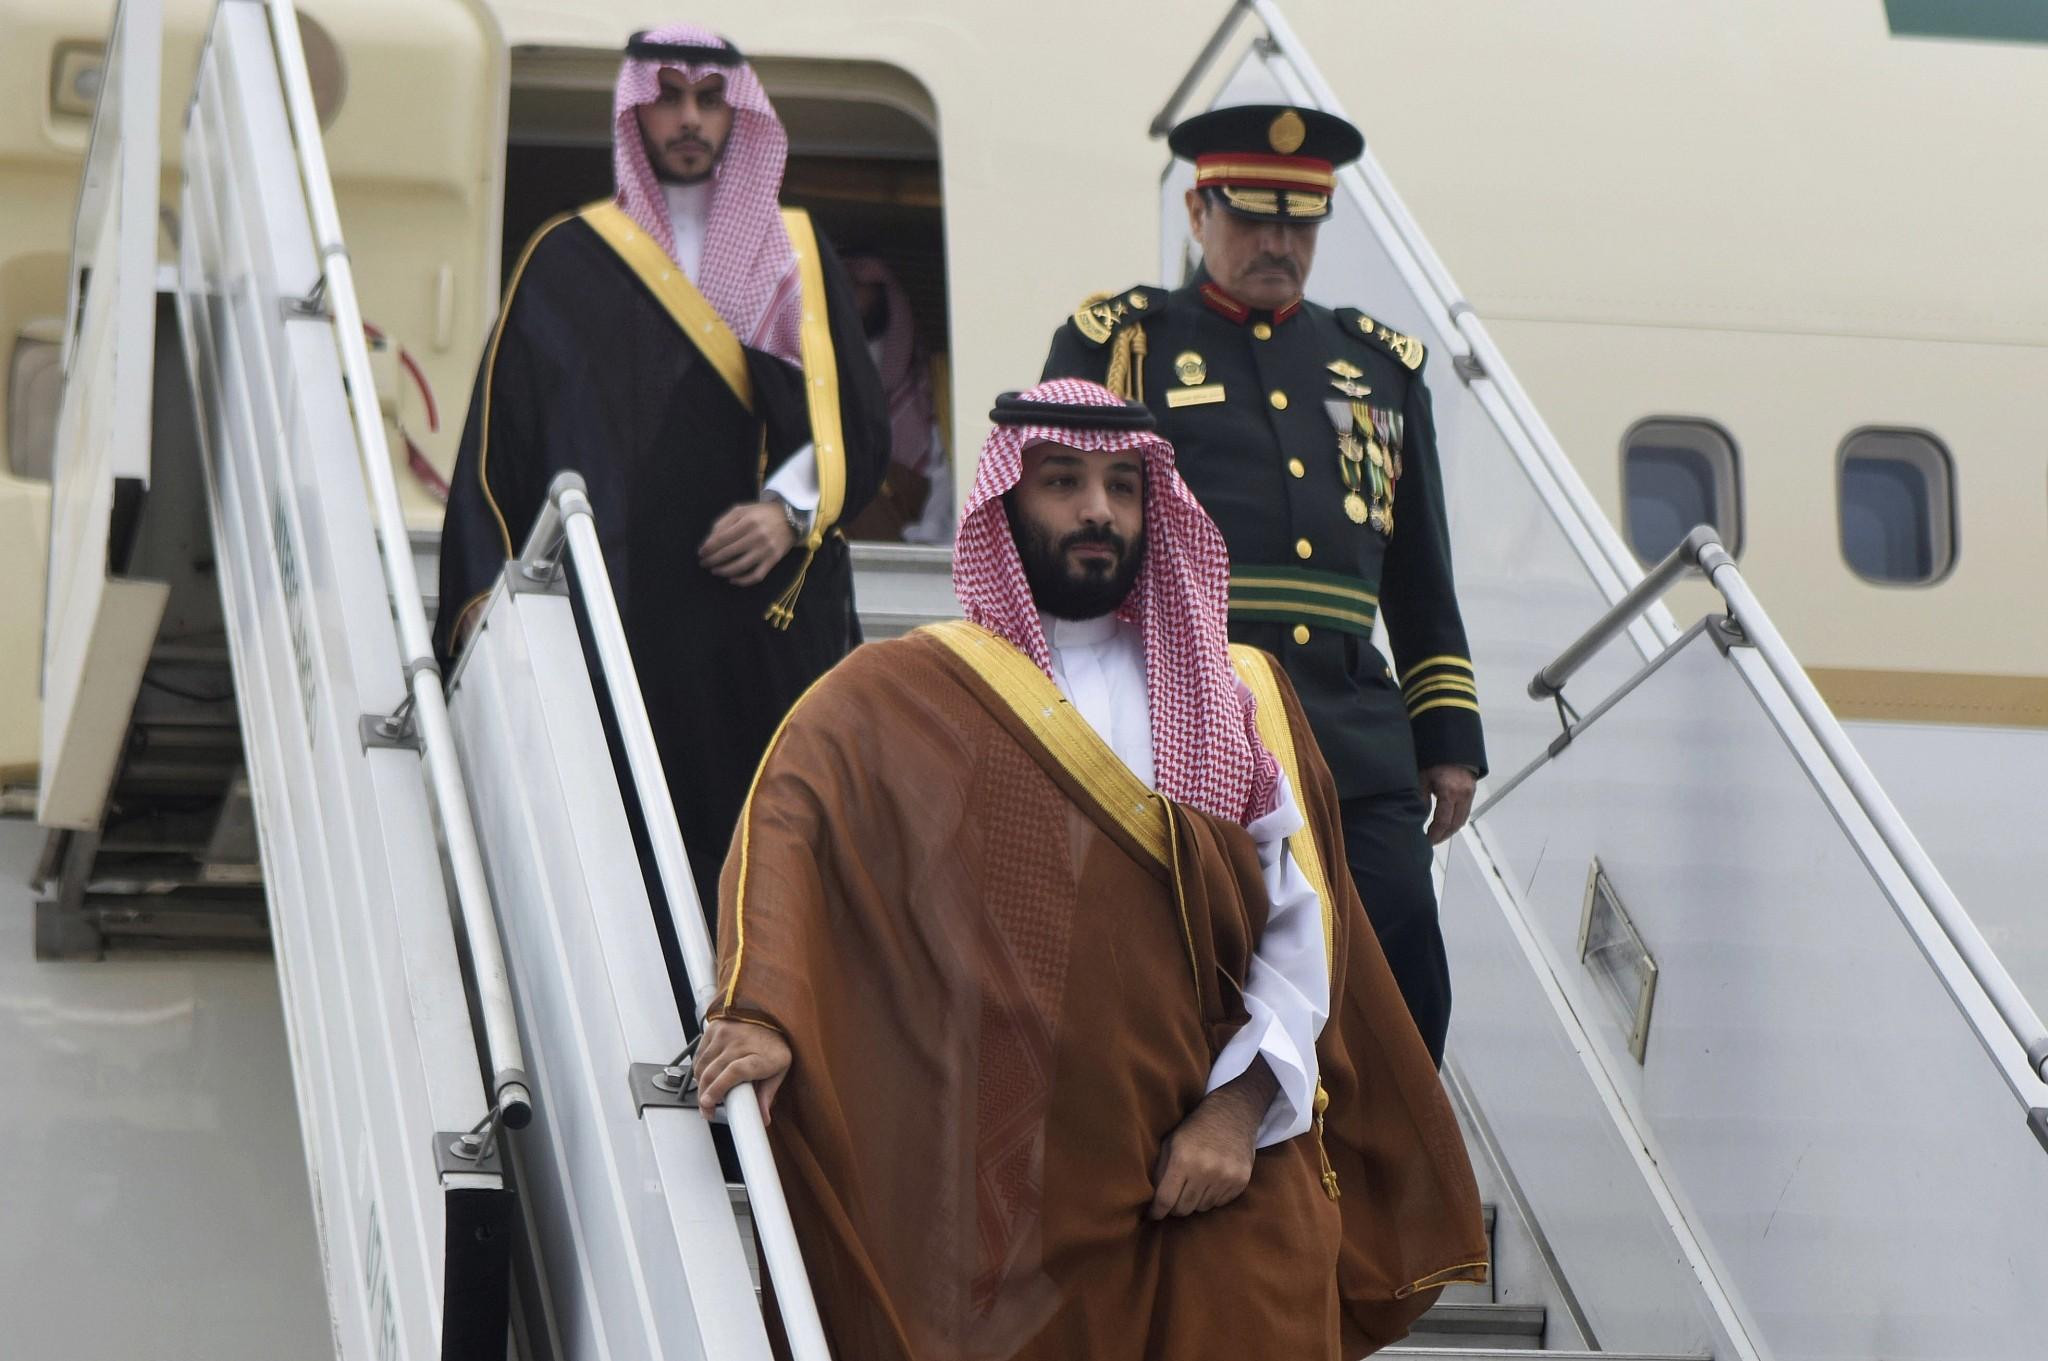 Efforts to stop Yemen war continue amid humanitarian concerns